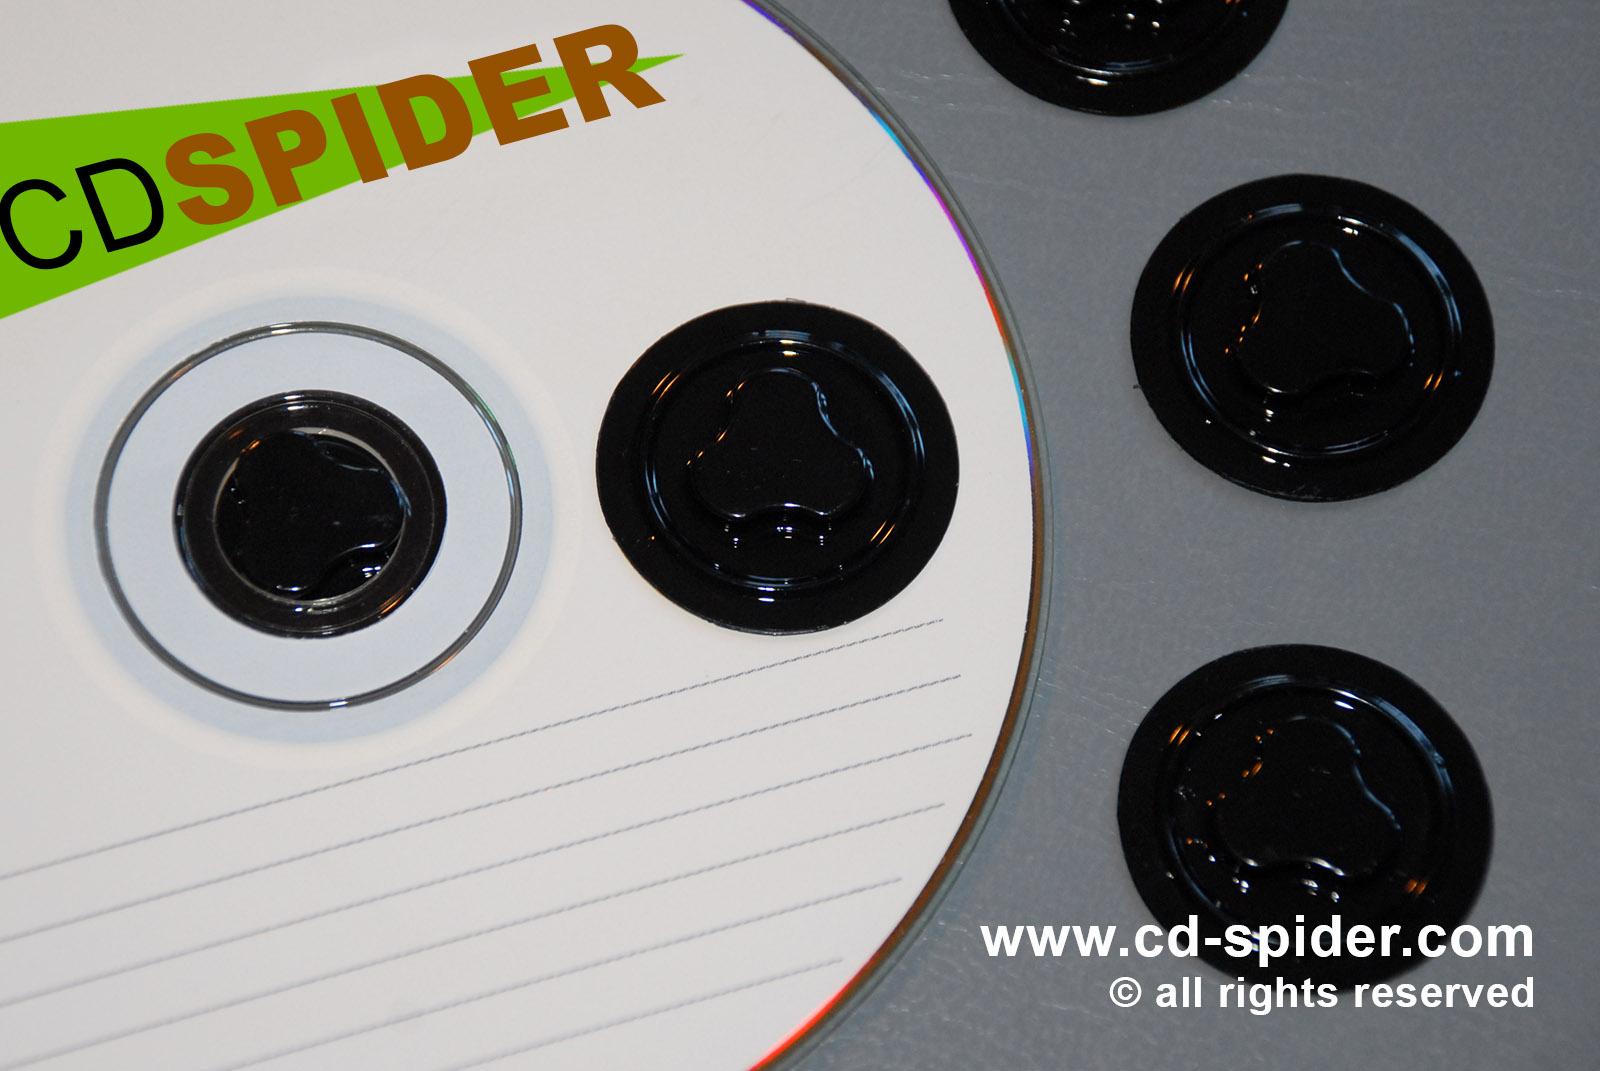 CD Spider Plastic Button Photos